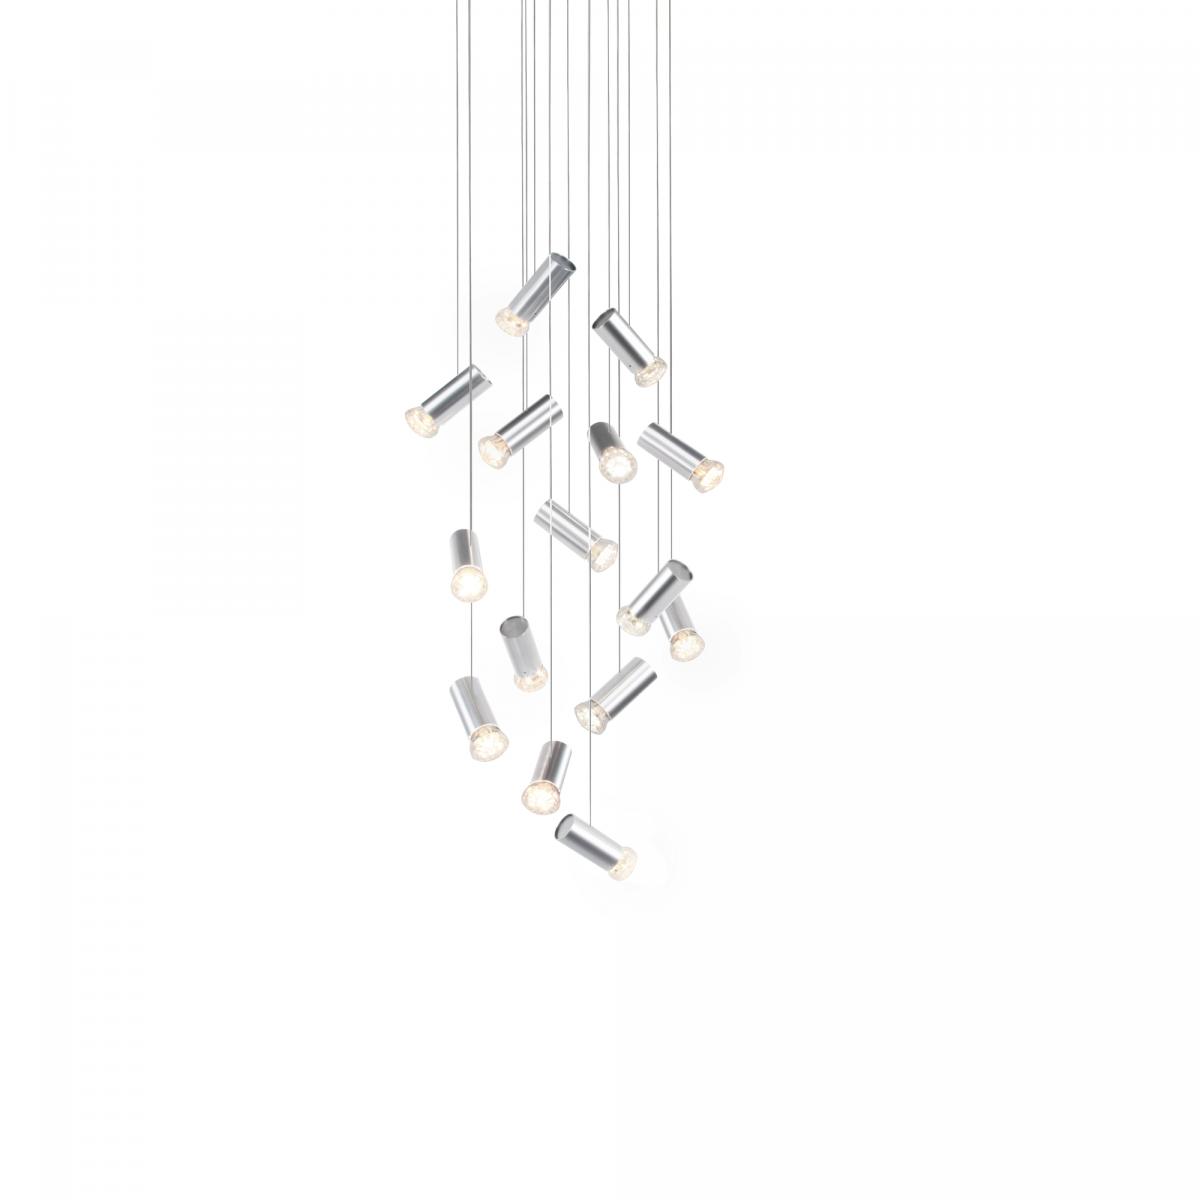 JSPR Jewels Angled 15 Silver